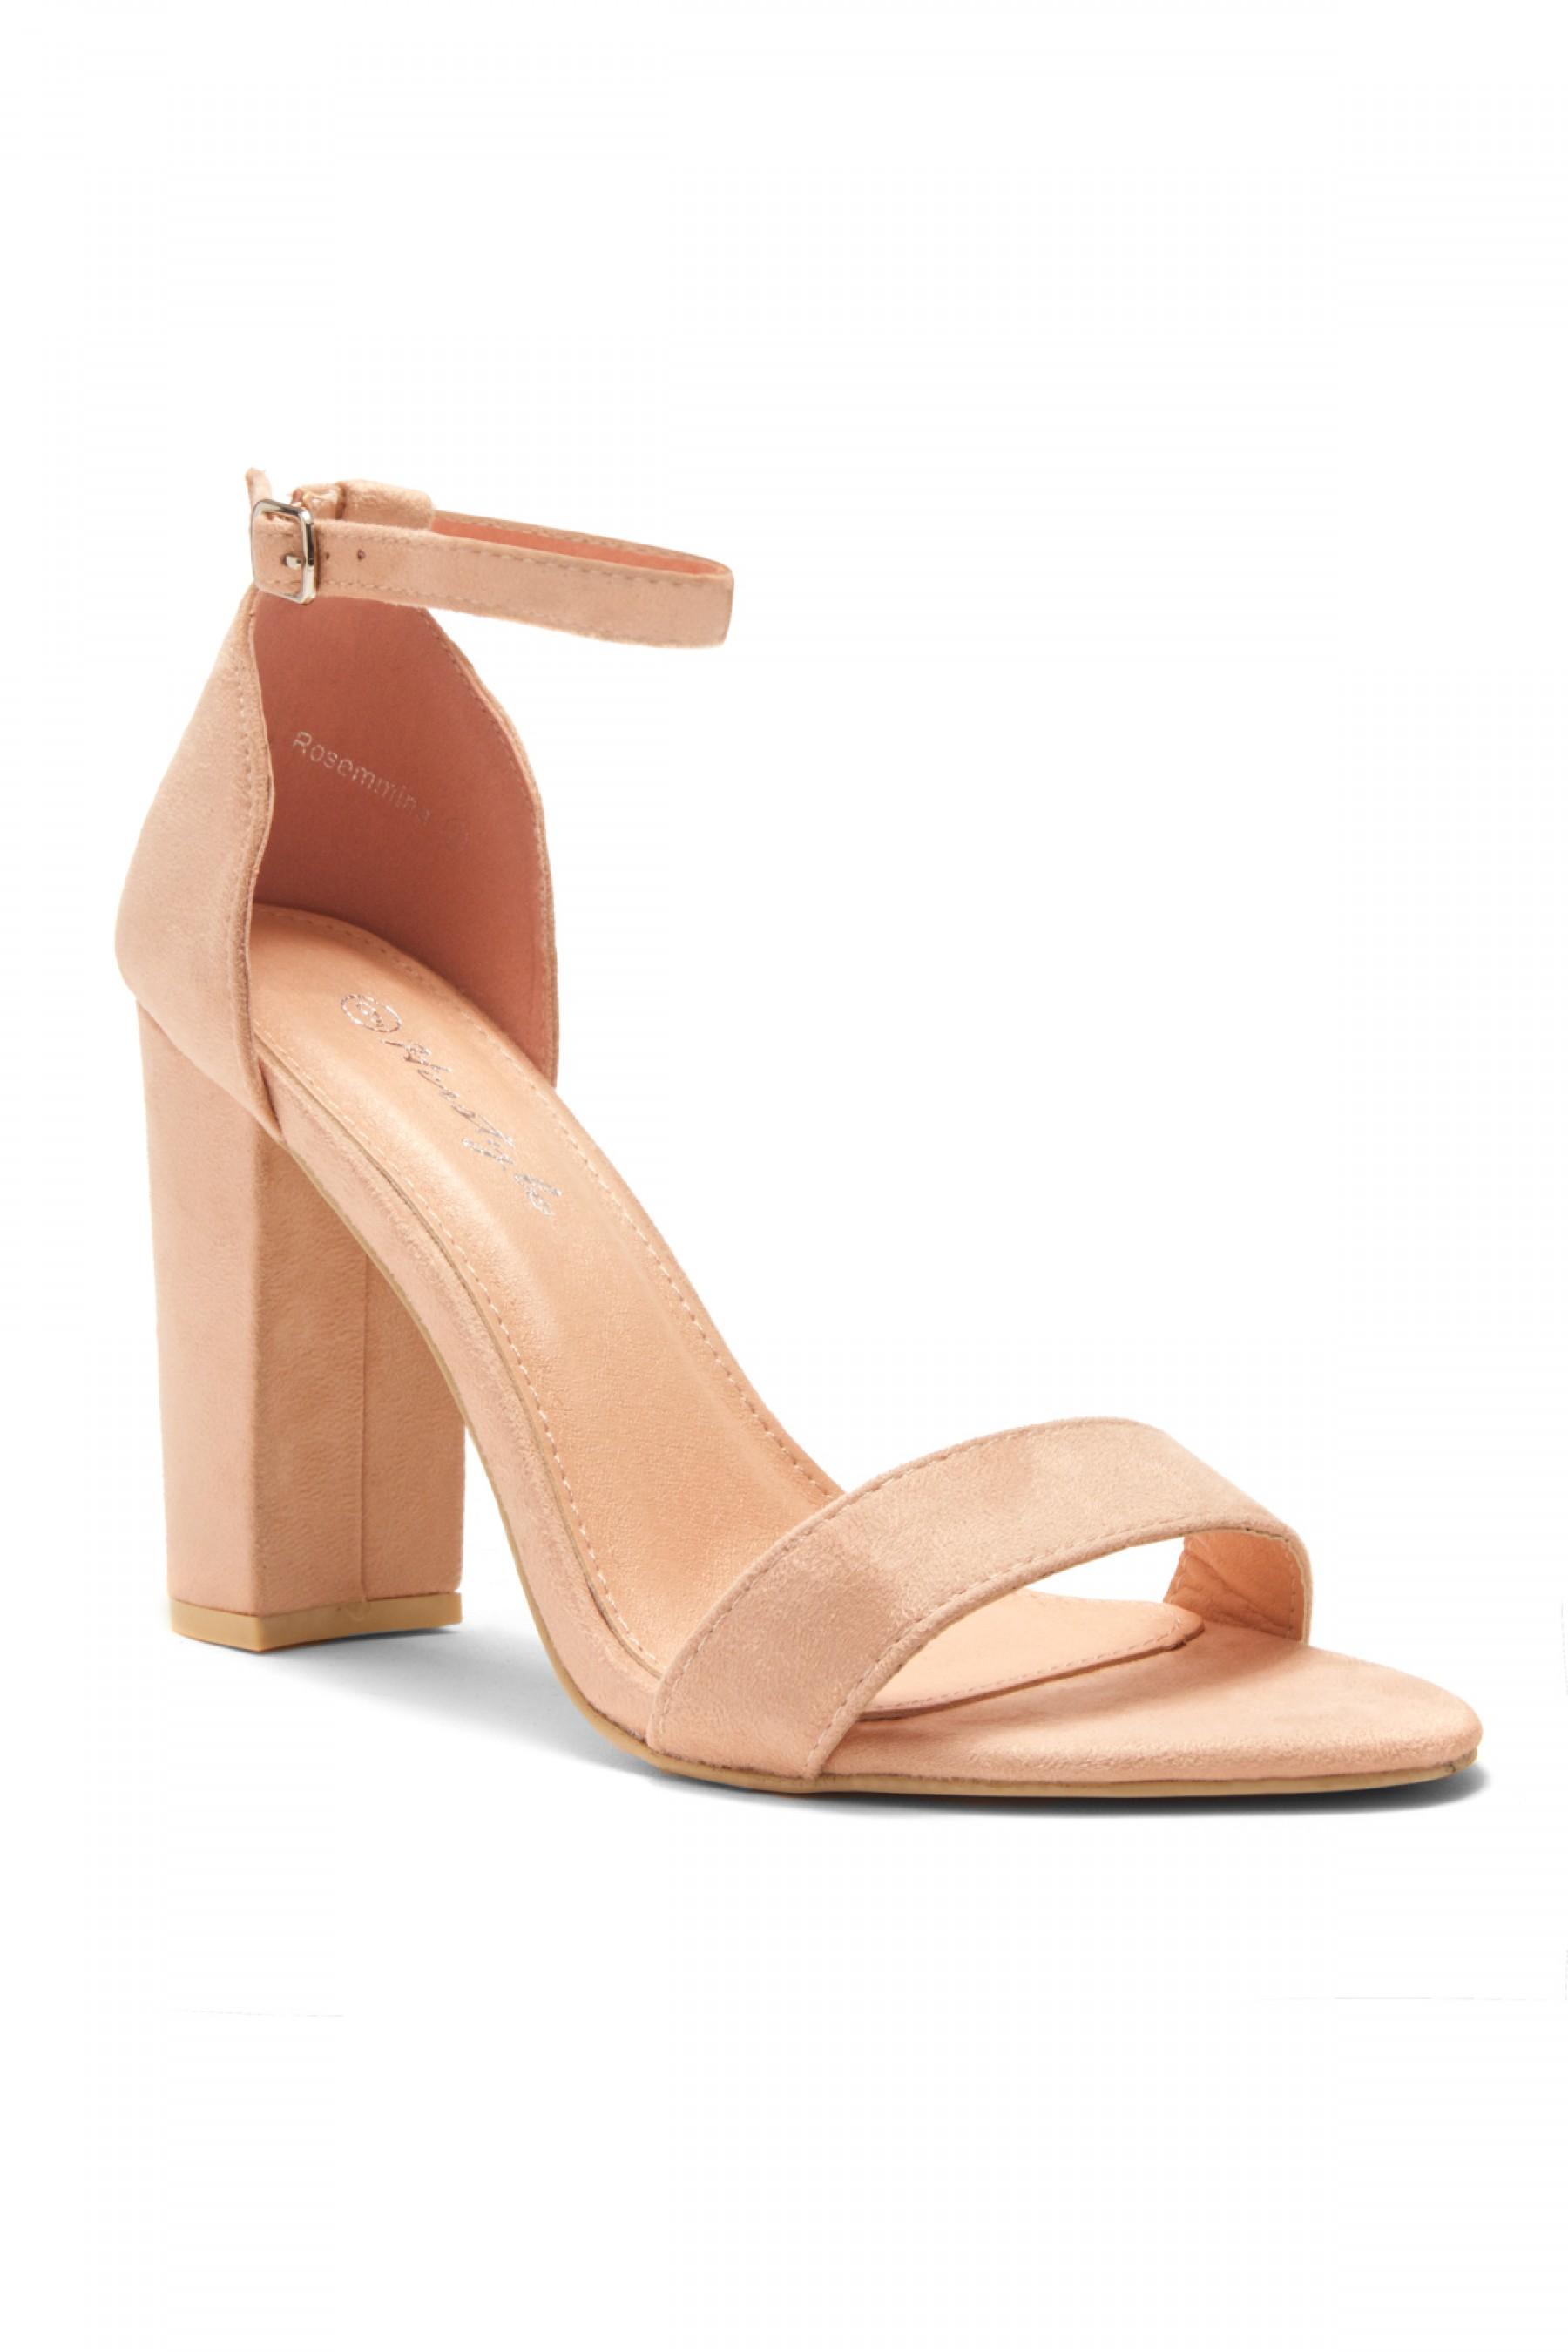 Rosemmina Open Toe Ankle Strap Chunky Heel (Blush)